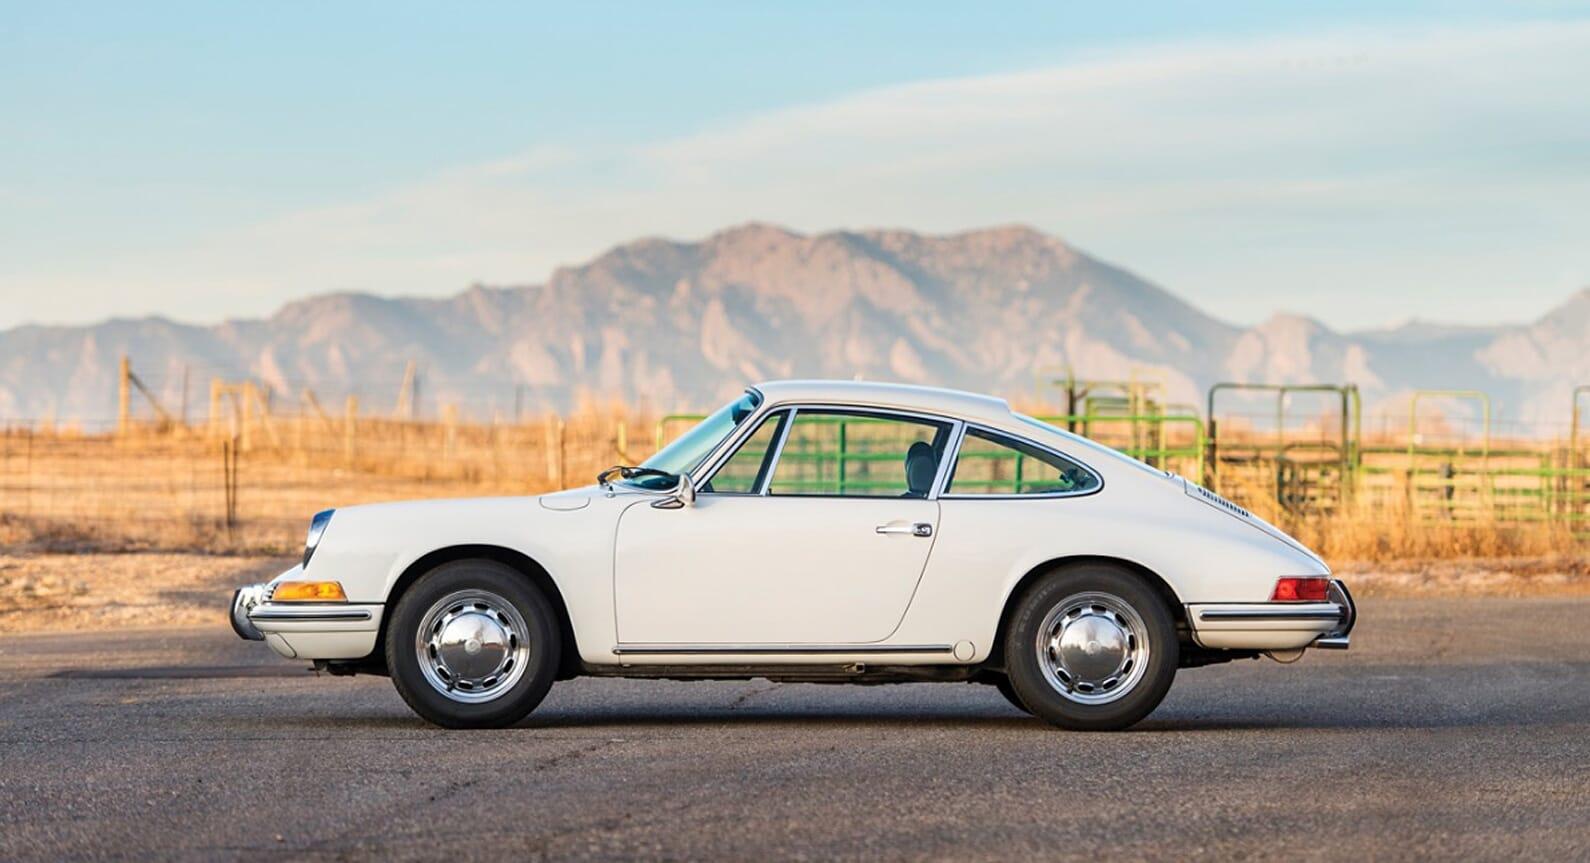 Classic Car Find Of The Week: 1969 Porsche 912